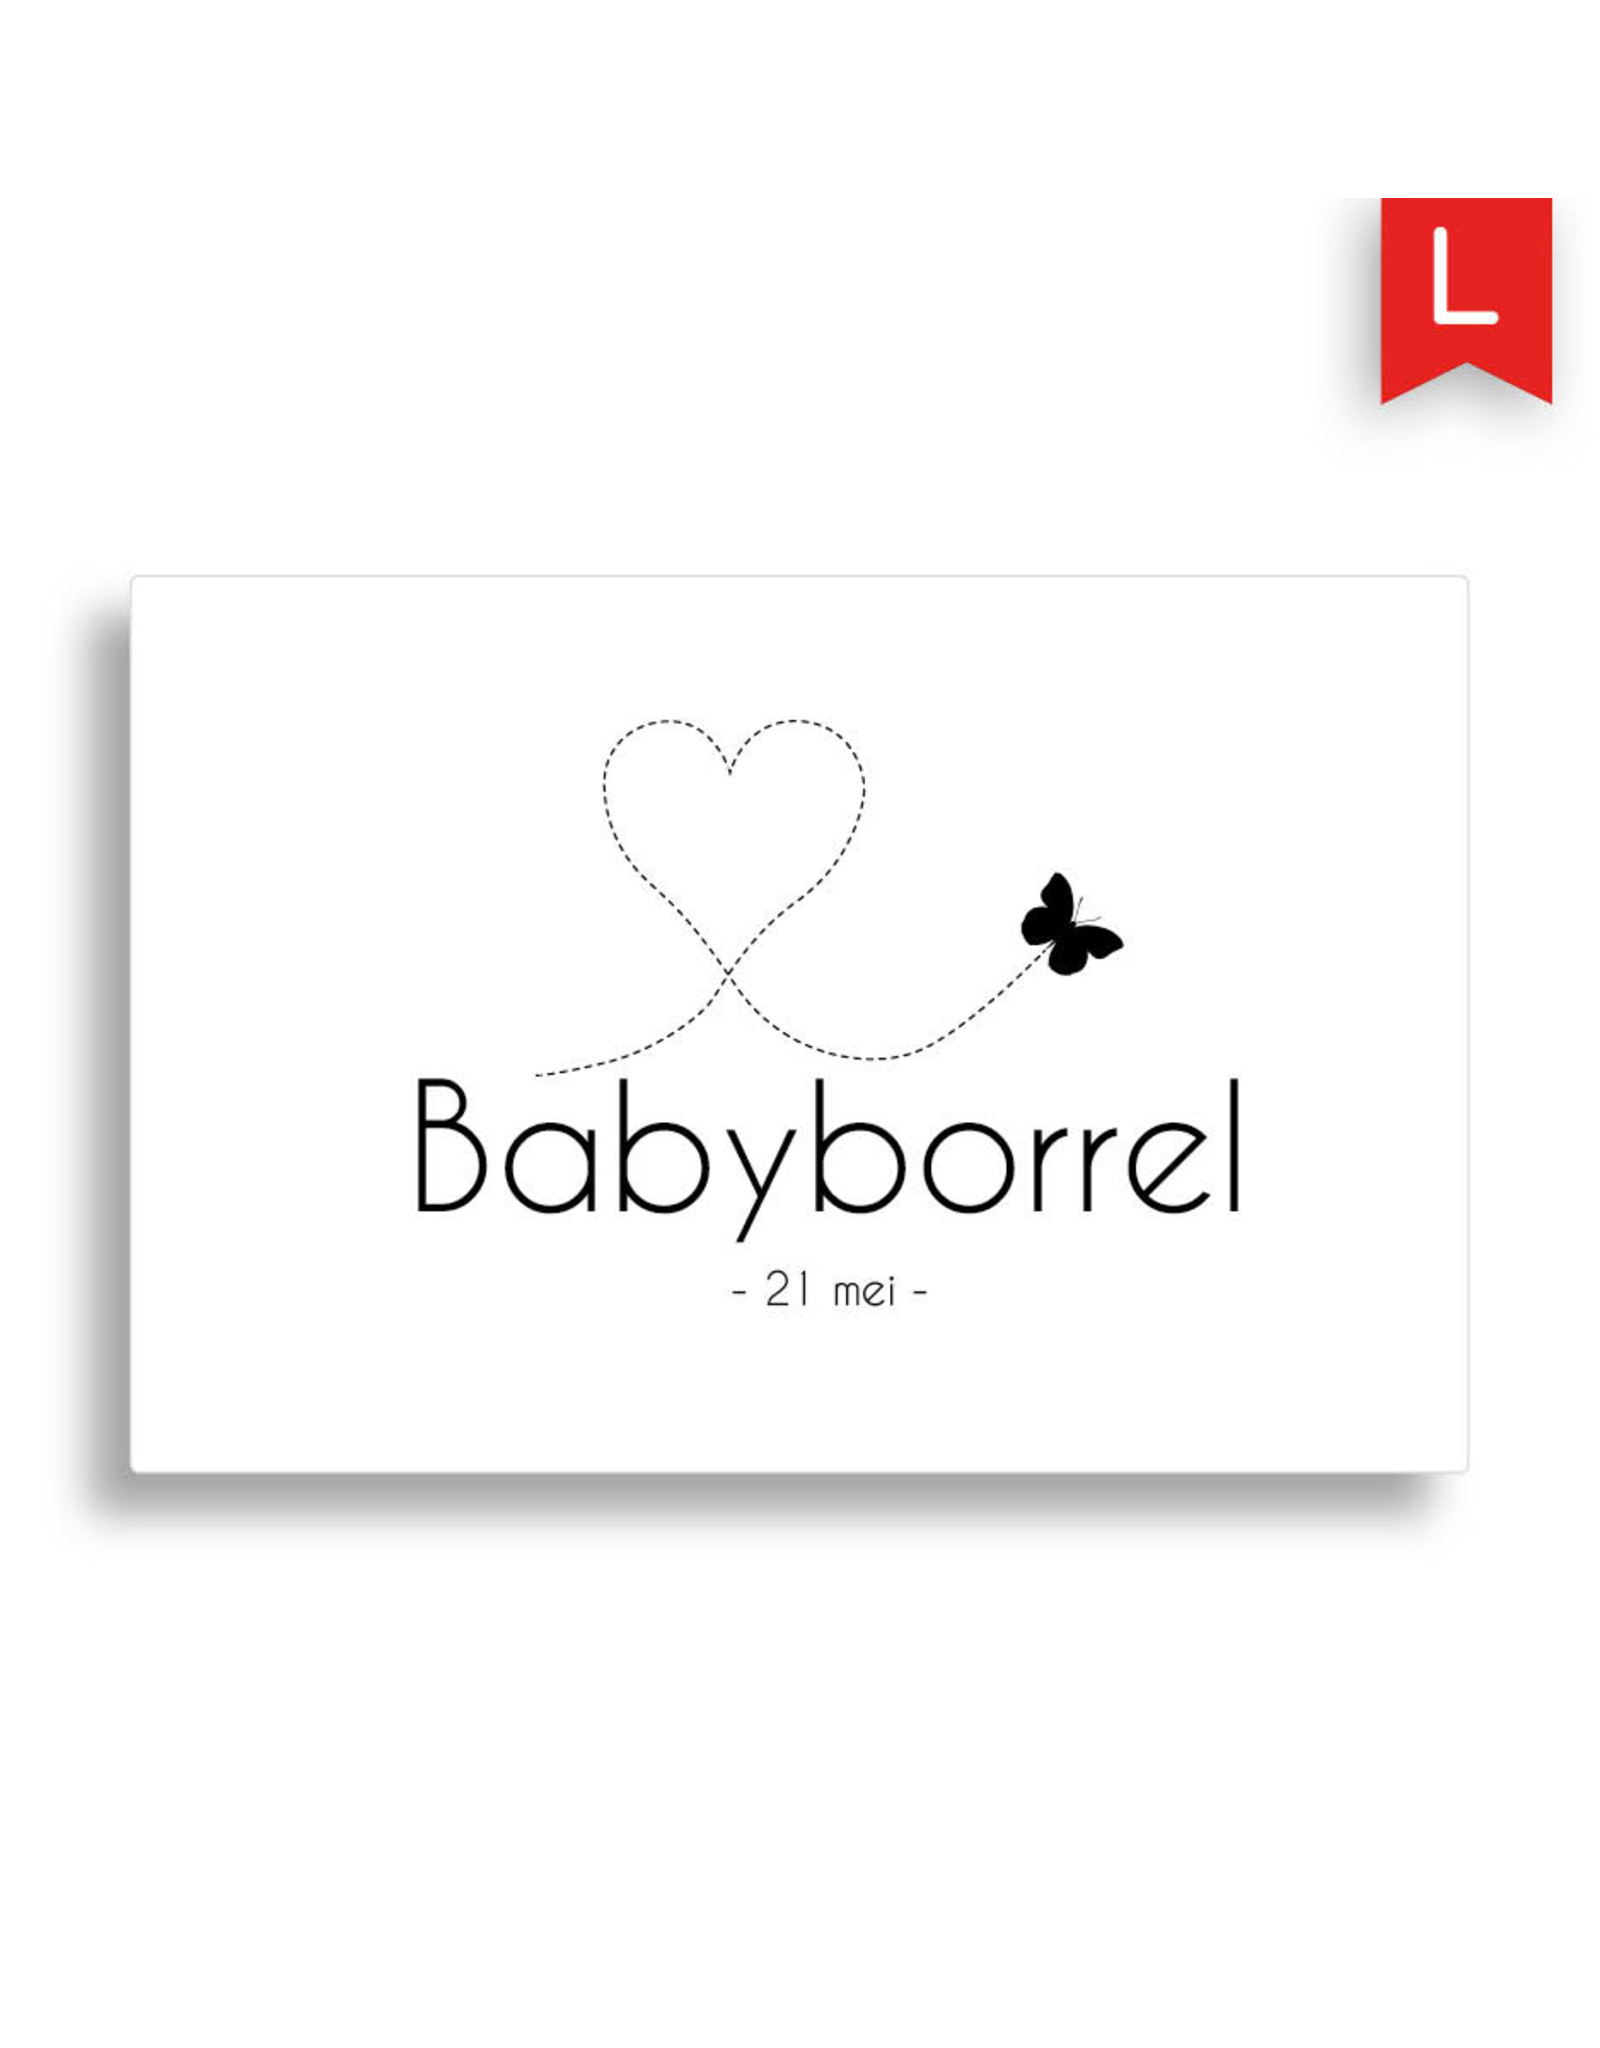 www.Robin.cards Babyborrel enkel rechthoek TOMMIE